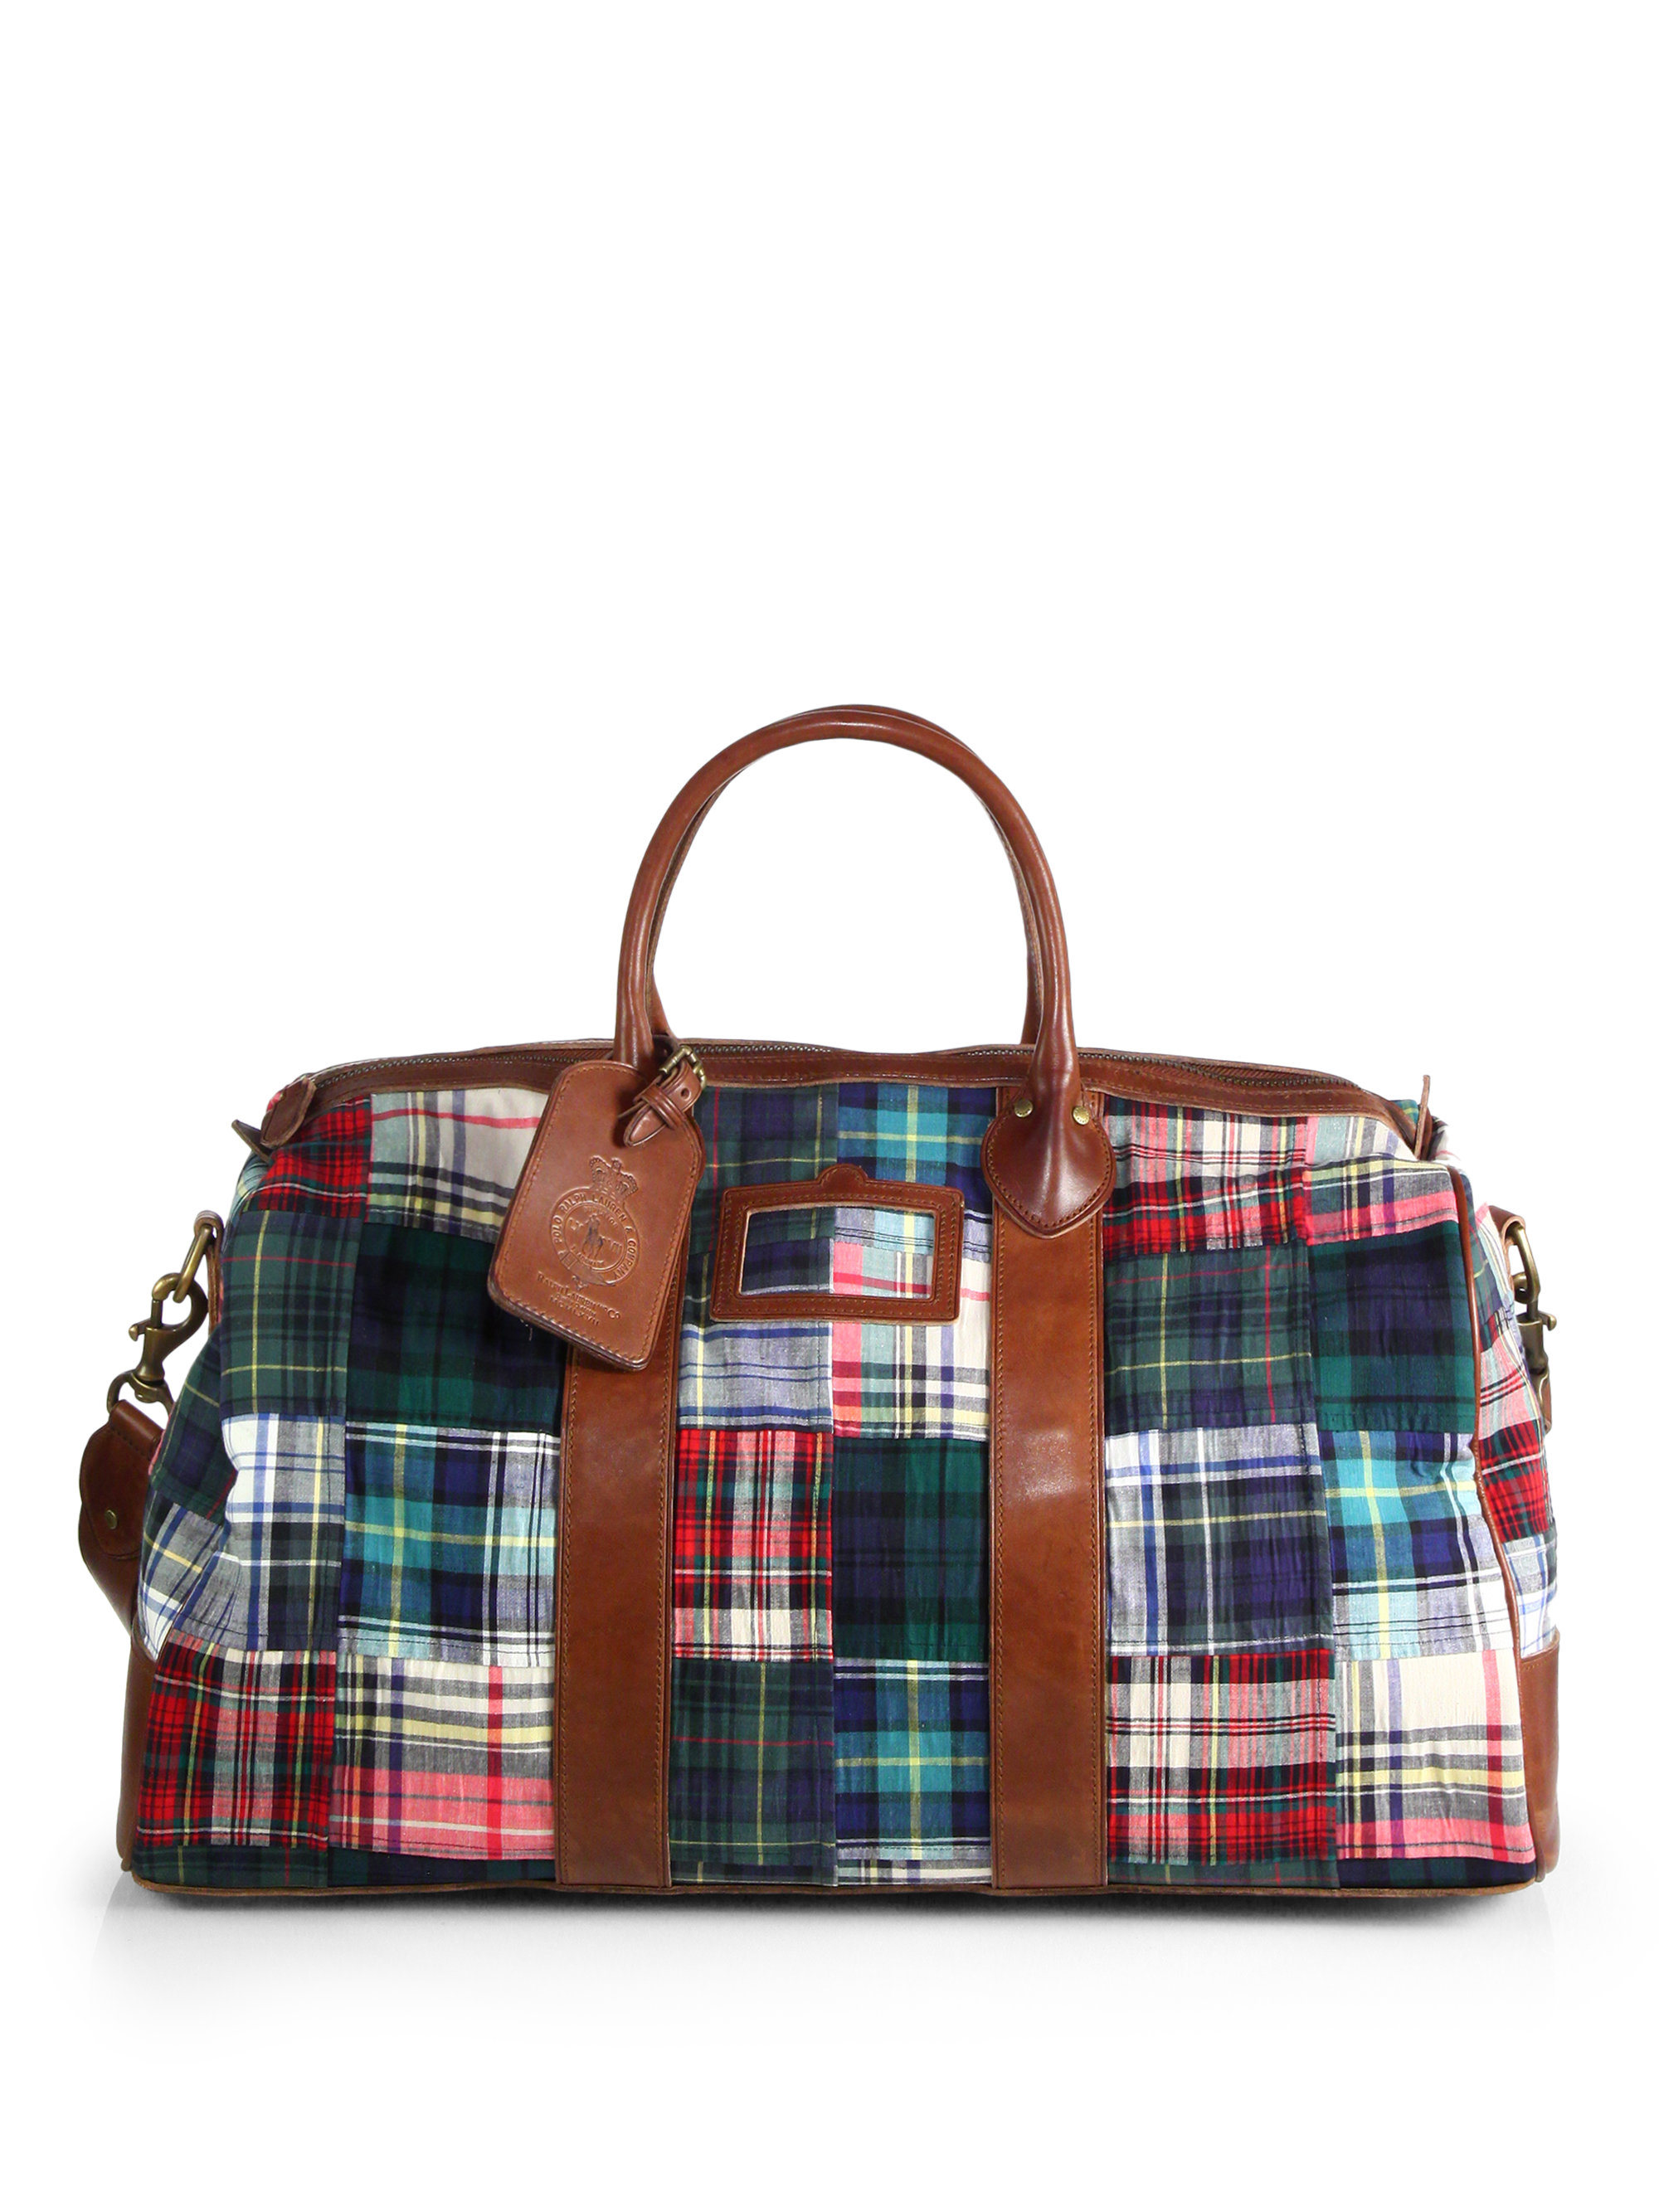 Lyst - Polo Ralph Lauren Cotton Madras Duffel Bag for Men fb8b4eda75